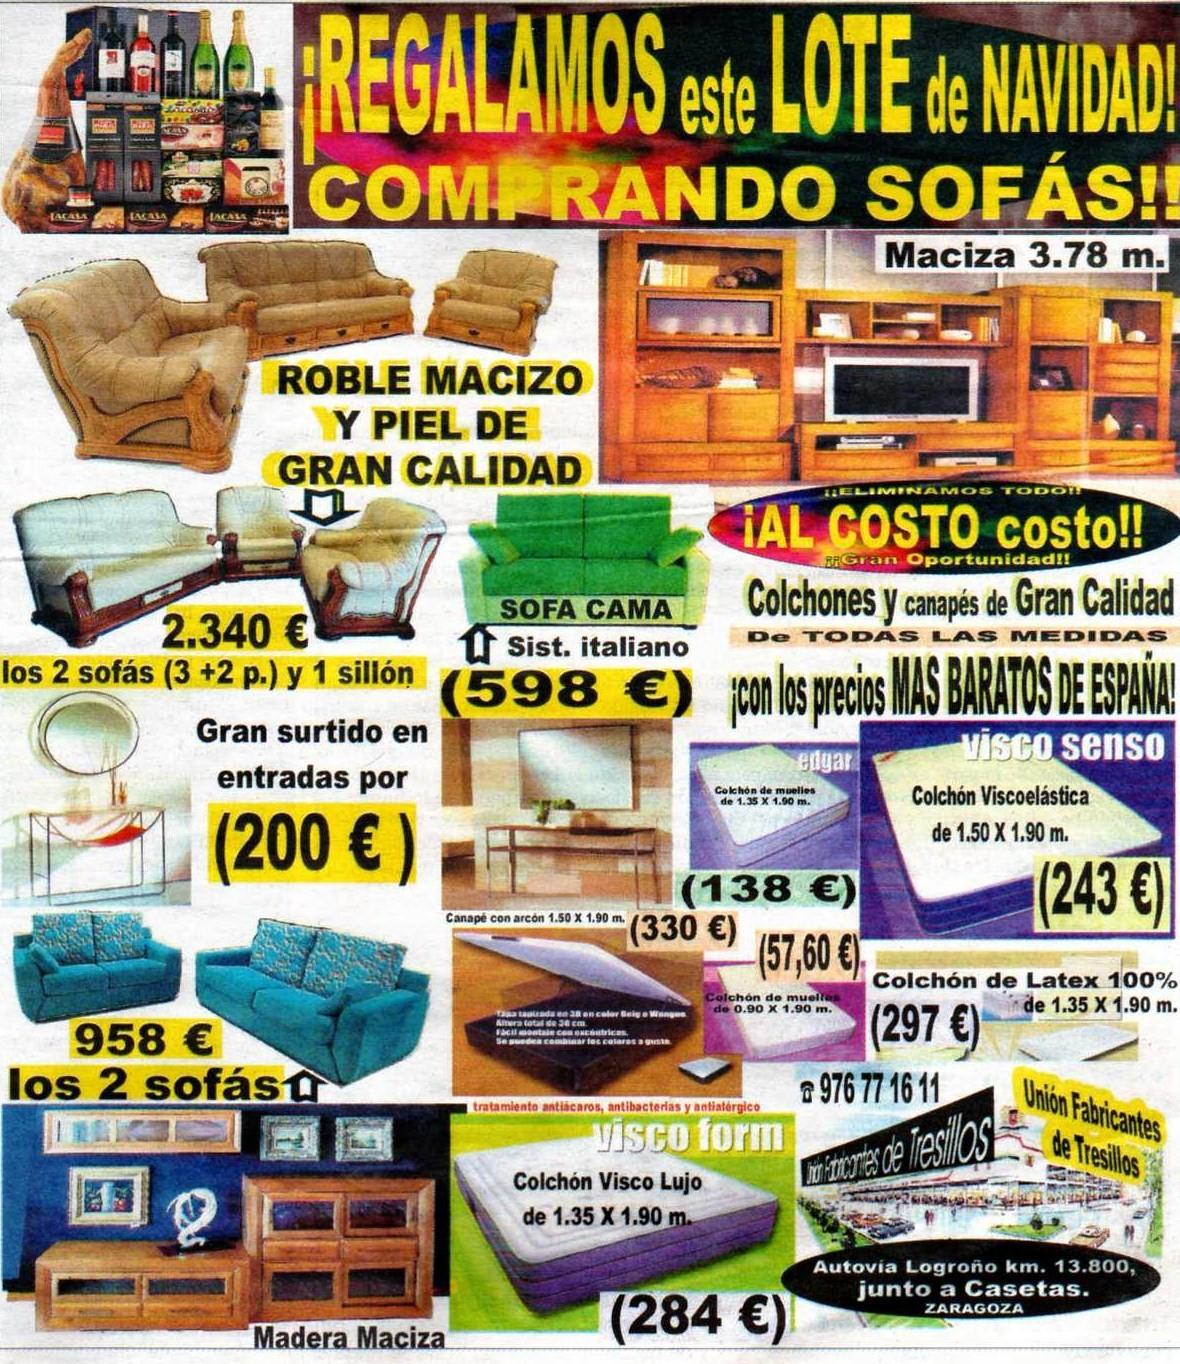 Uni n fabricantes de tresillos noviembre 2011 for Tresillos economicos